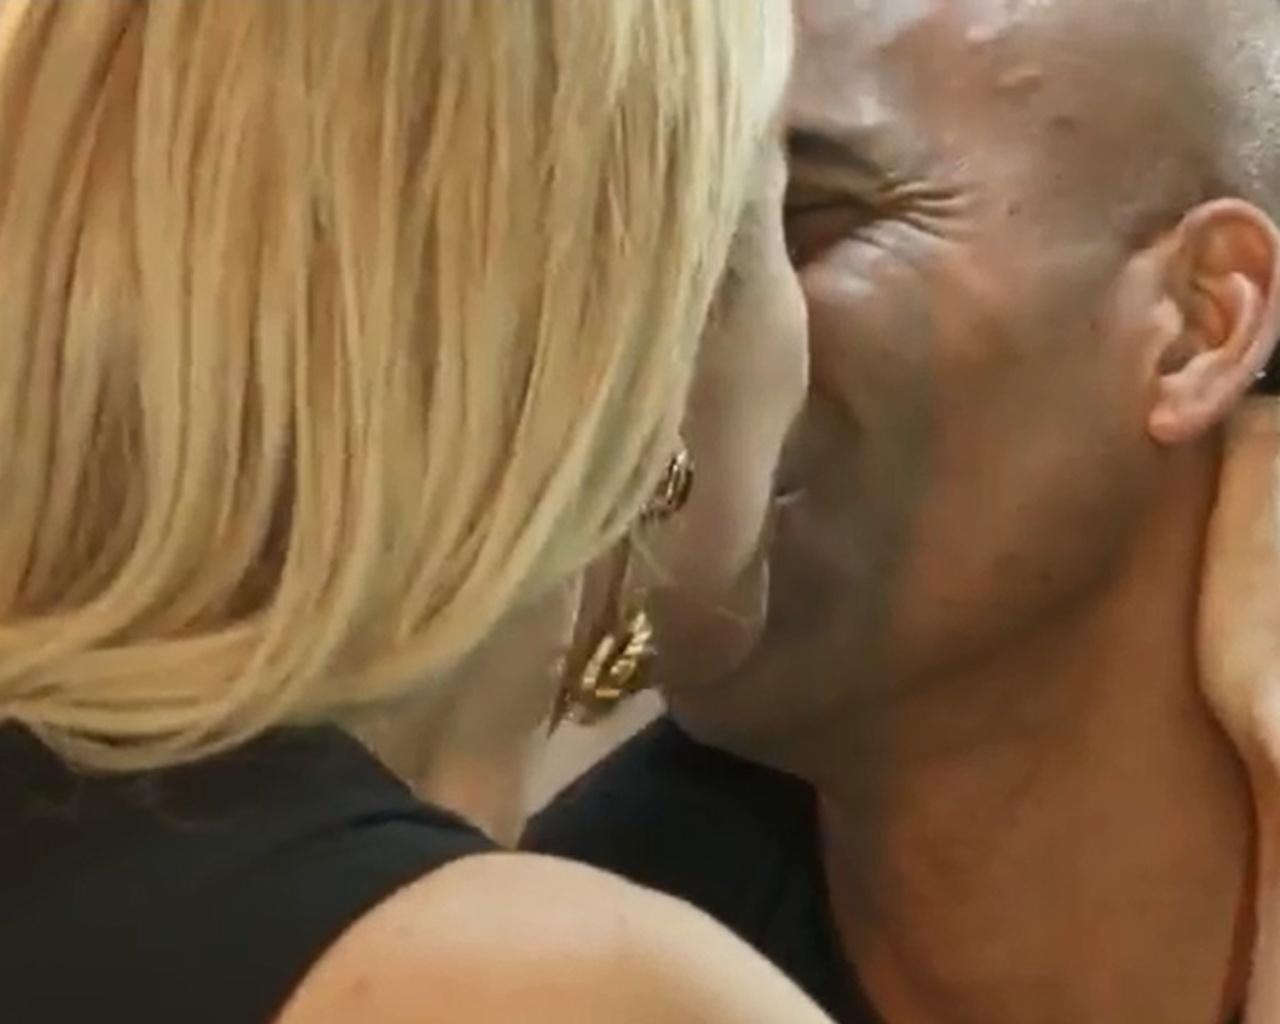 15.jul.2014 - Anatonia Fontenelle beija Emerson Sheik ao fim de entrevista